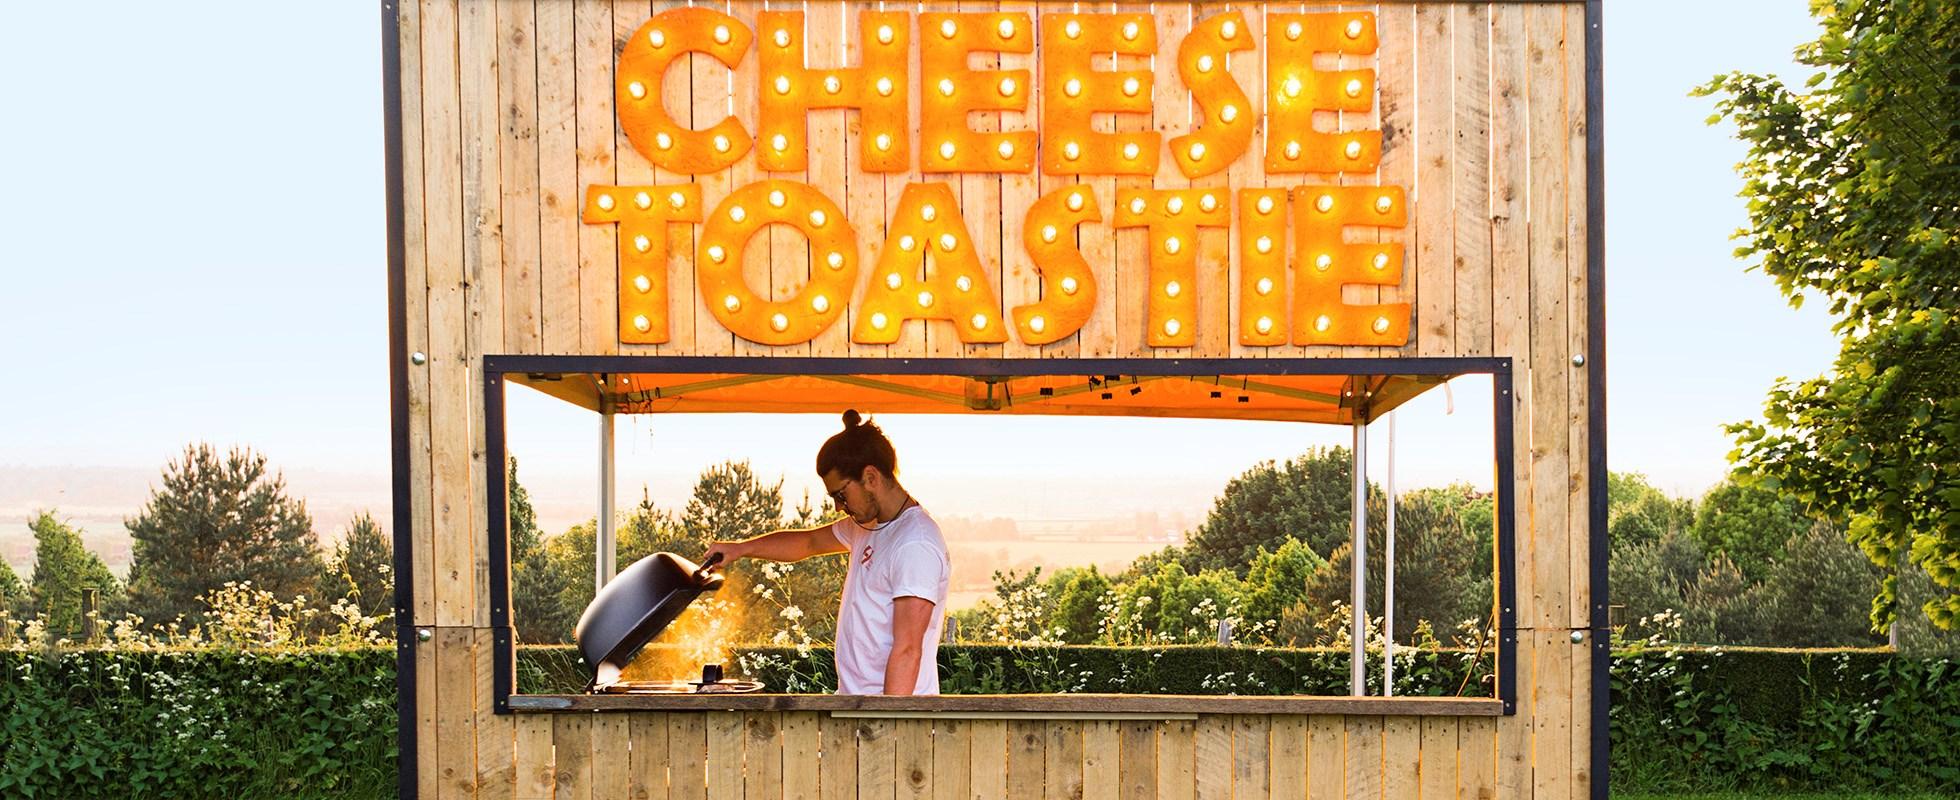 Top 16 Uk Street Food Stalls The Best Street Food In The